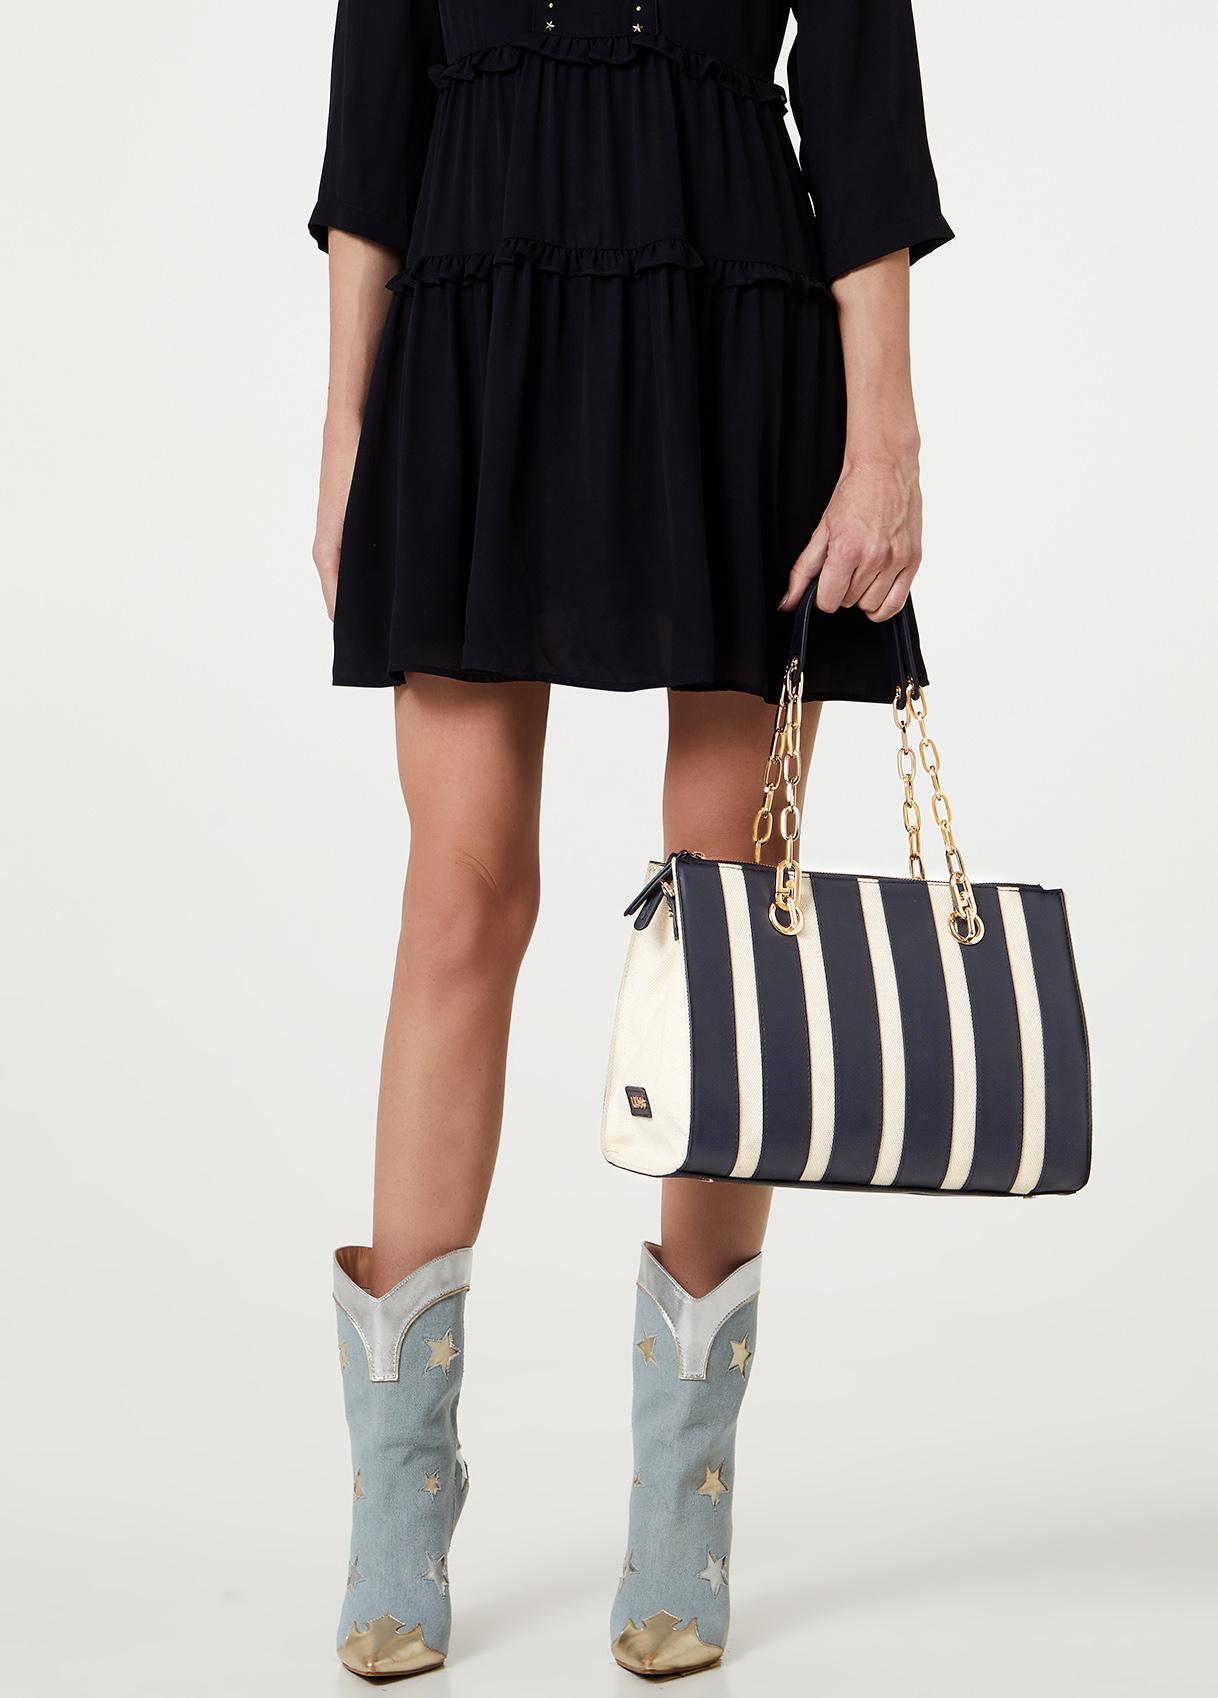 Shopping bag a righe-90013-liujo-large